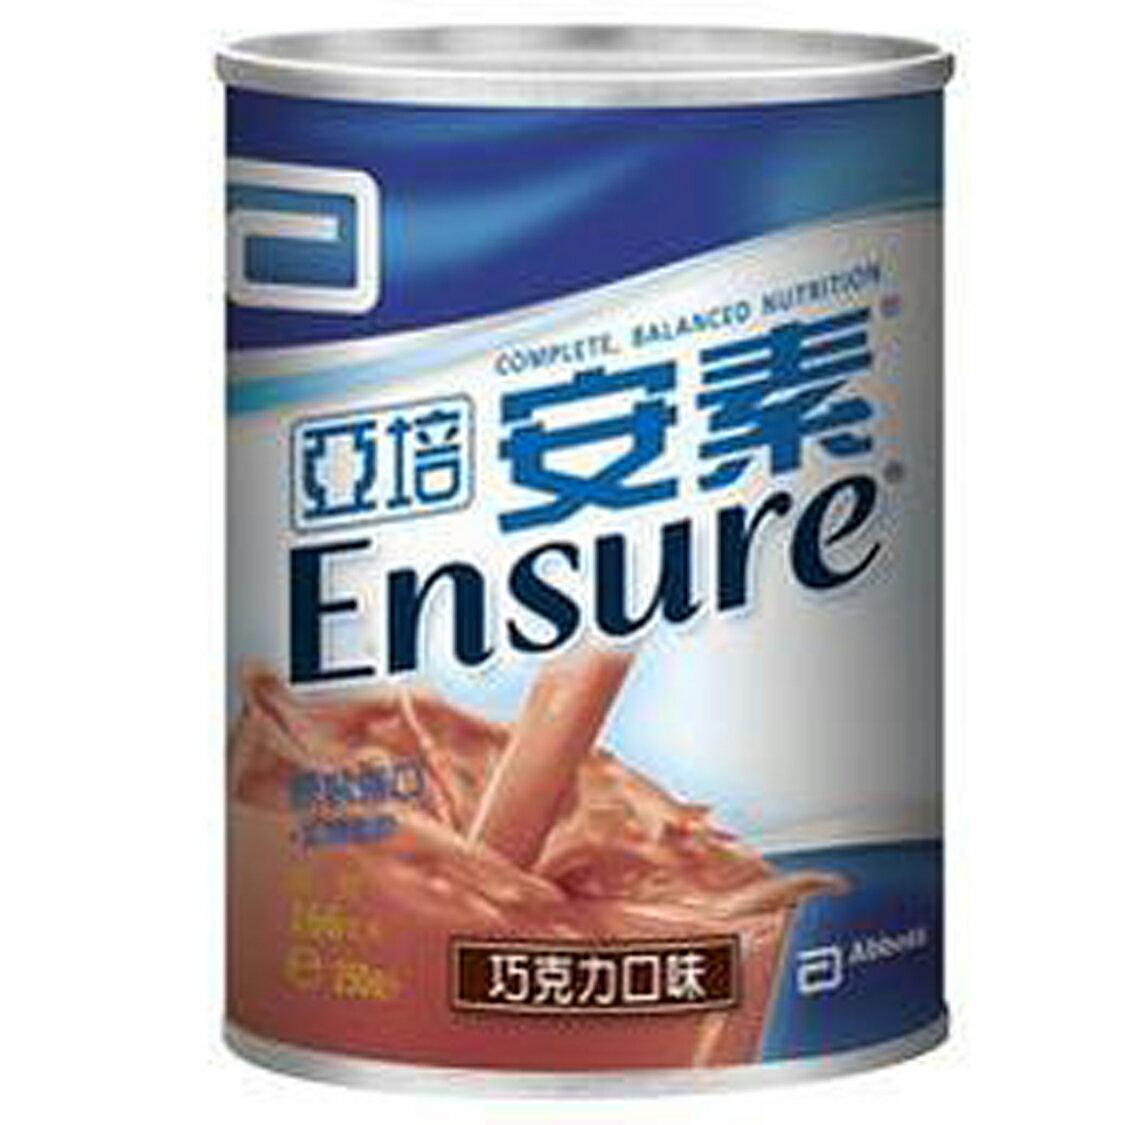 Abbott 亞培 ENSURE 安素(巧克力) 237ml x24入【瑞昌藥局】005123